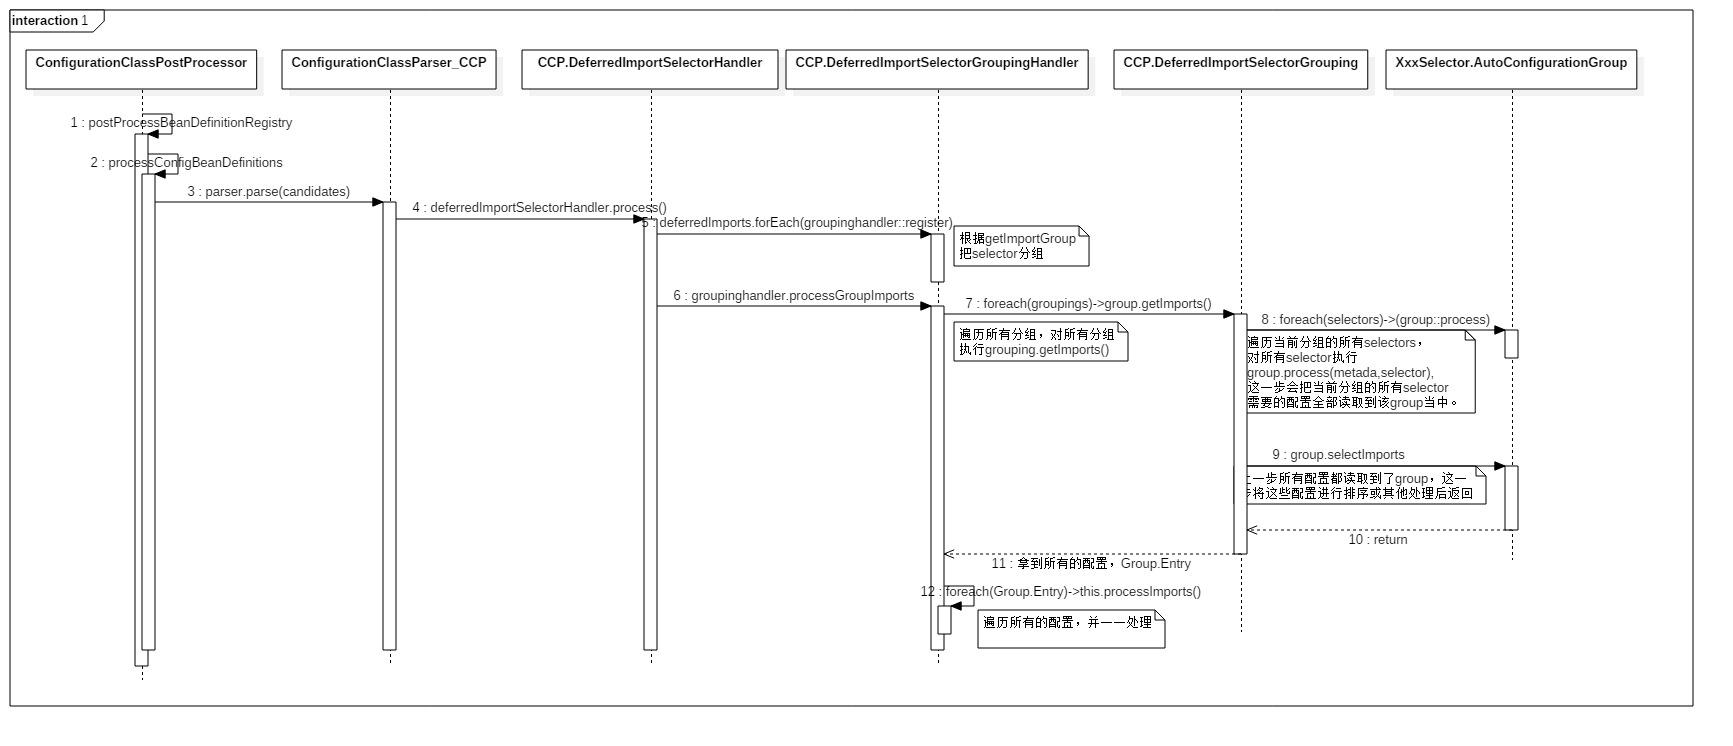 ConfigurationClassPostProcessor_Sequence